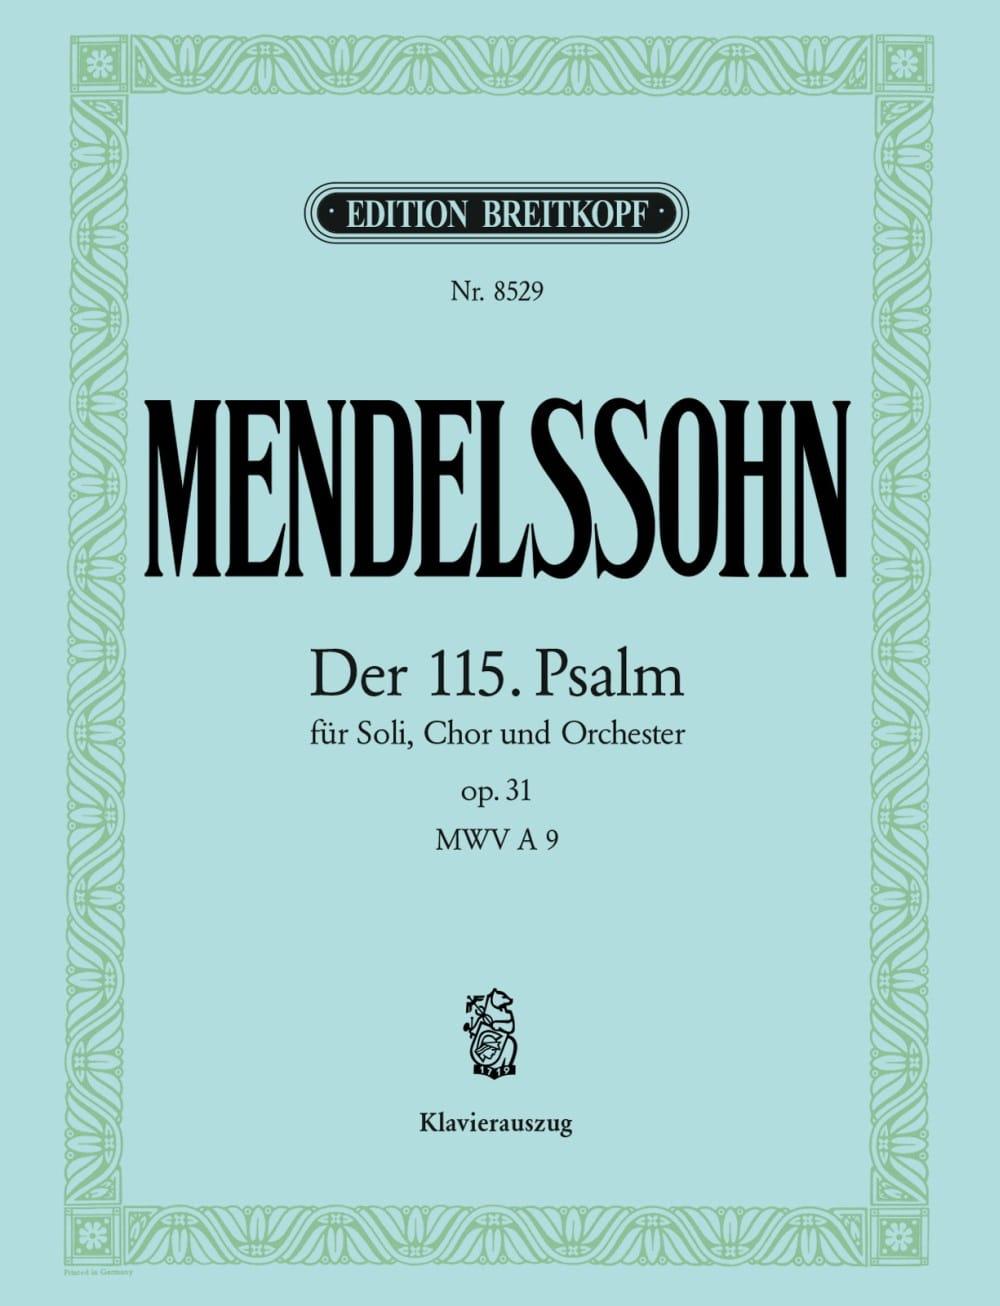 Psaume 115 Opus 31 - MENDELSSOHN - Partition - laflutedepan.com